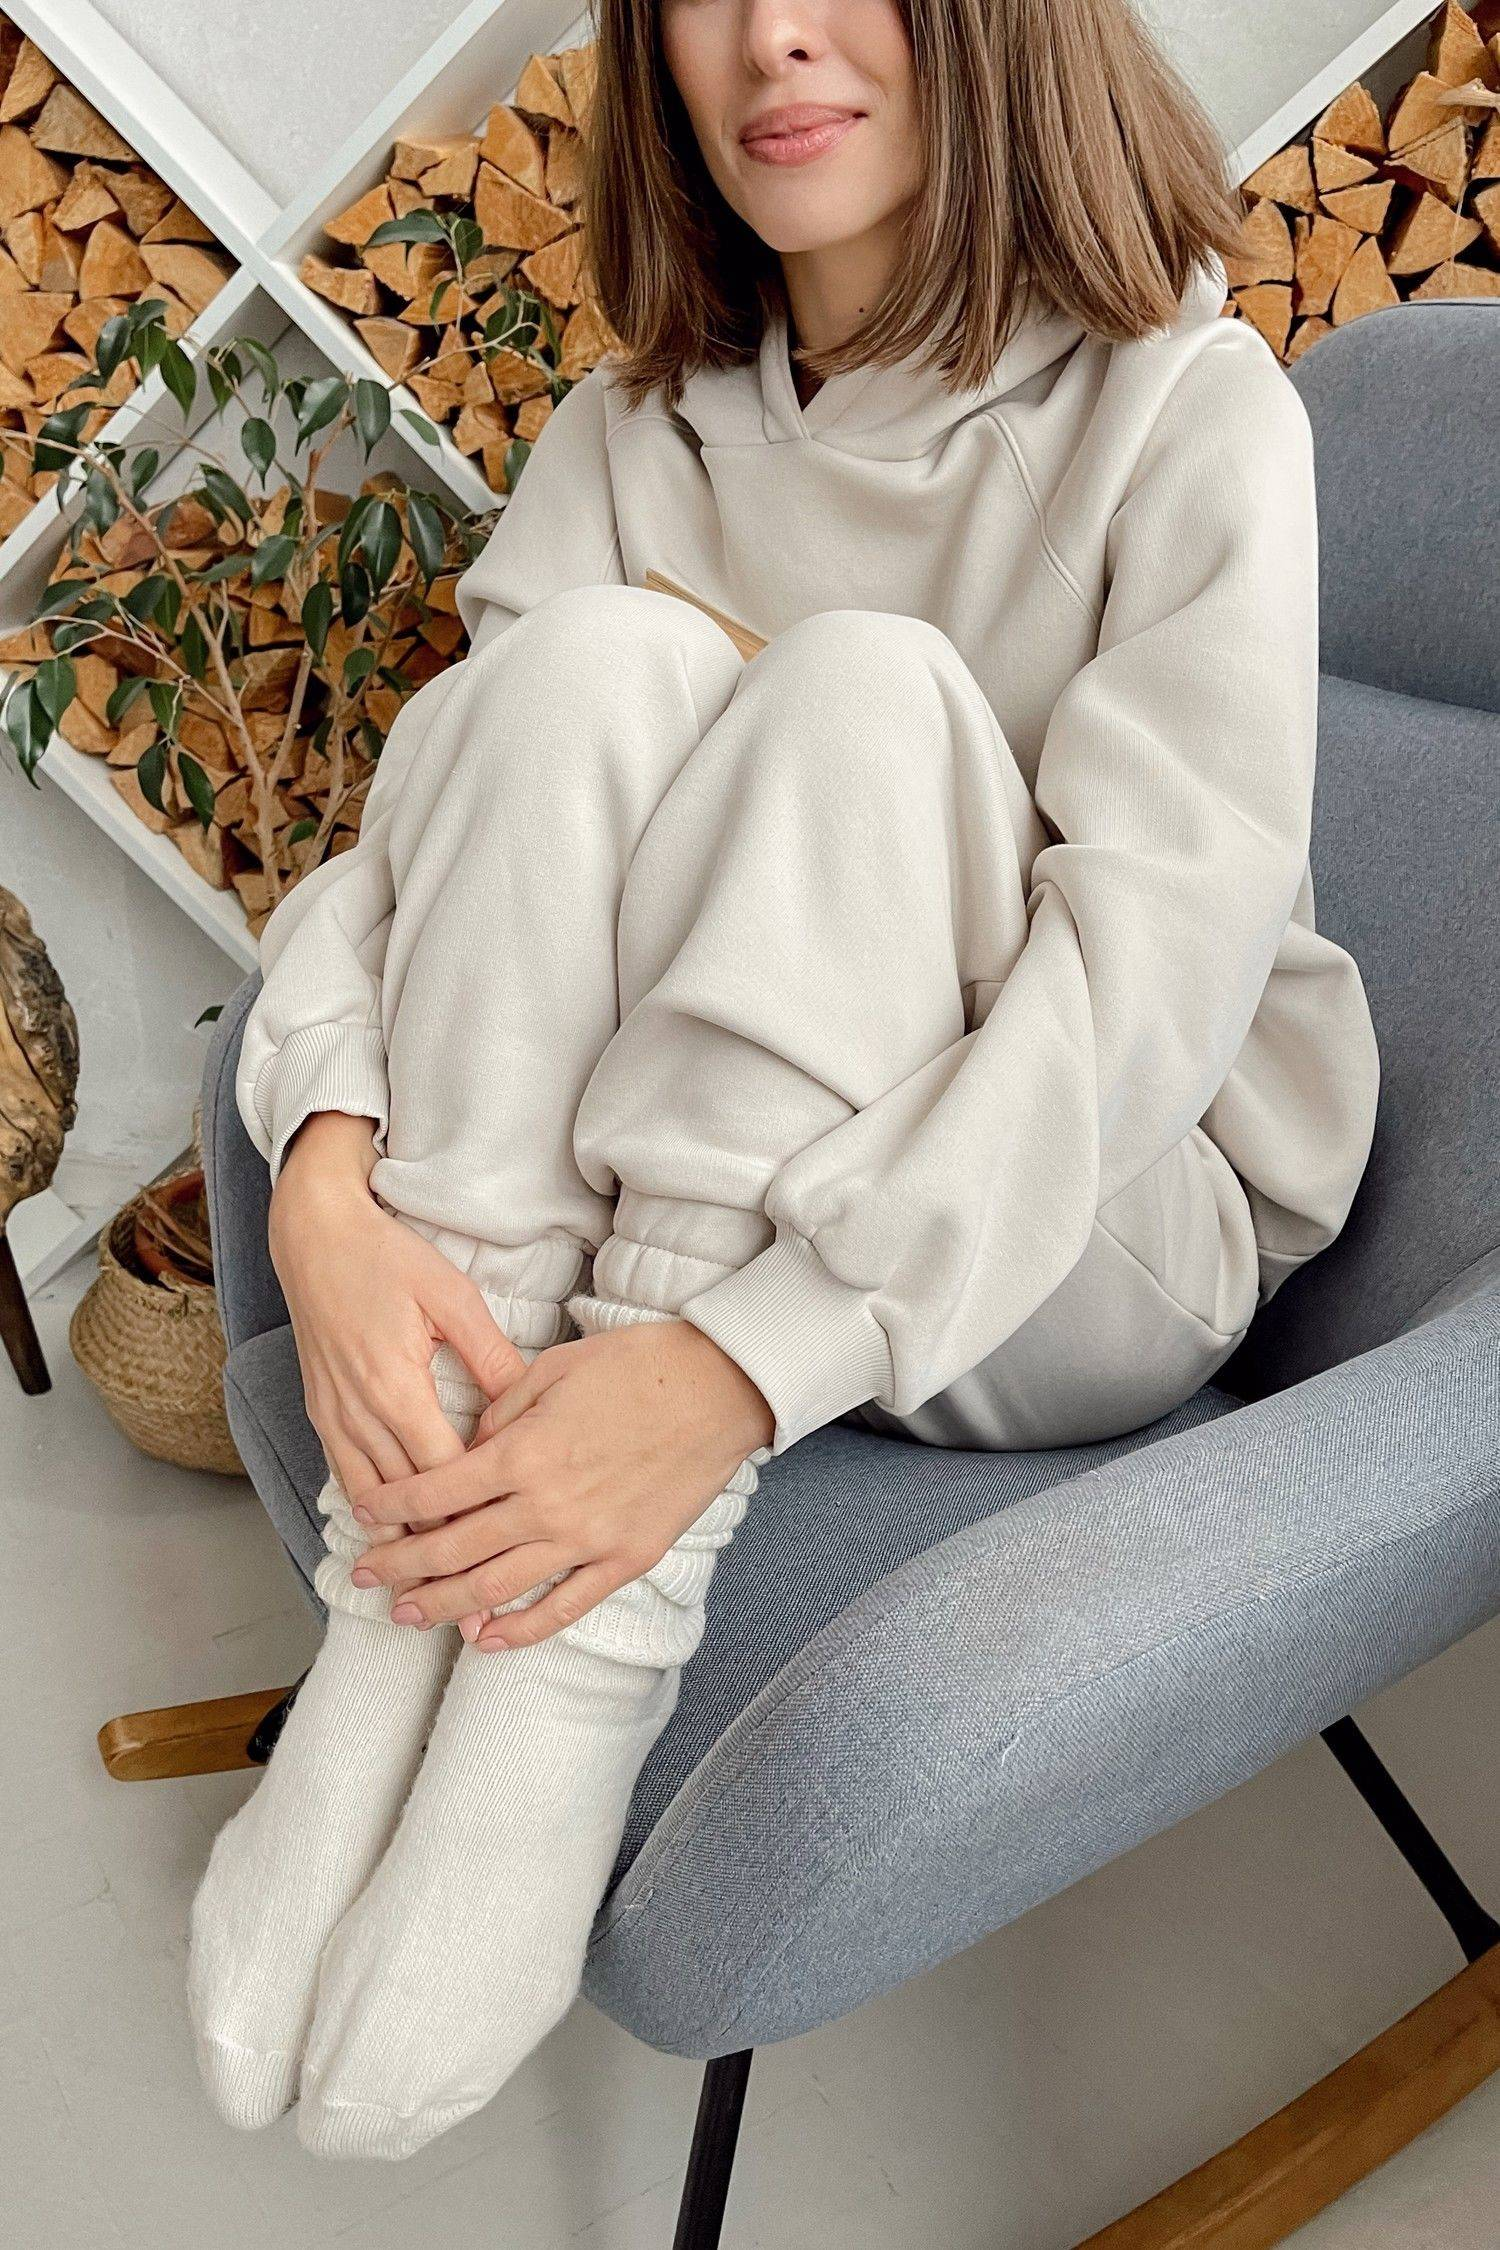 Костюм со спортивными брюками и худи milk - THE LACE